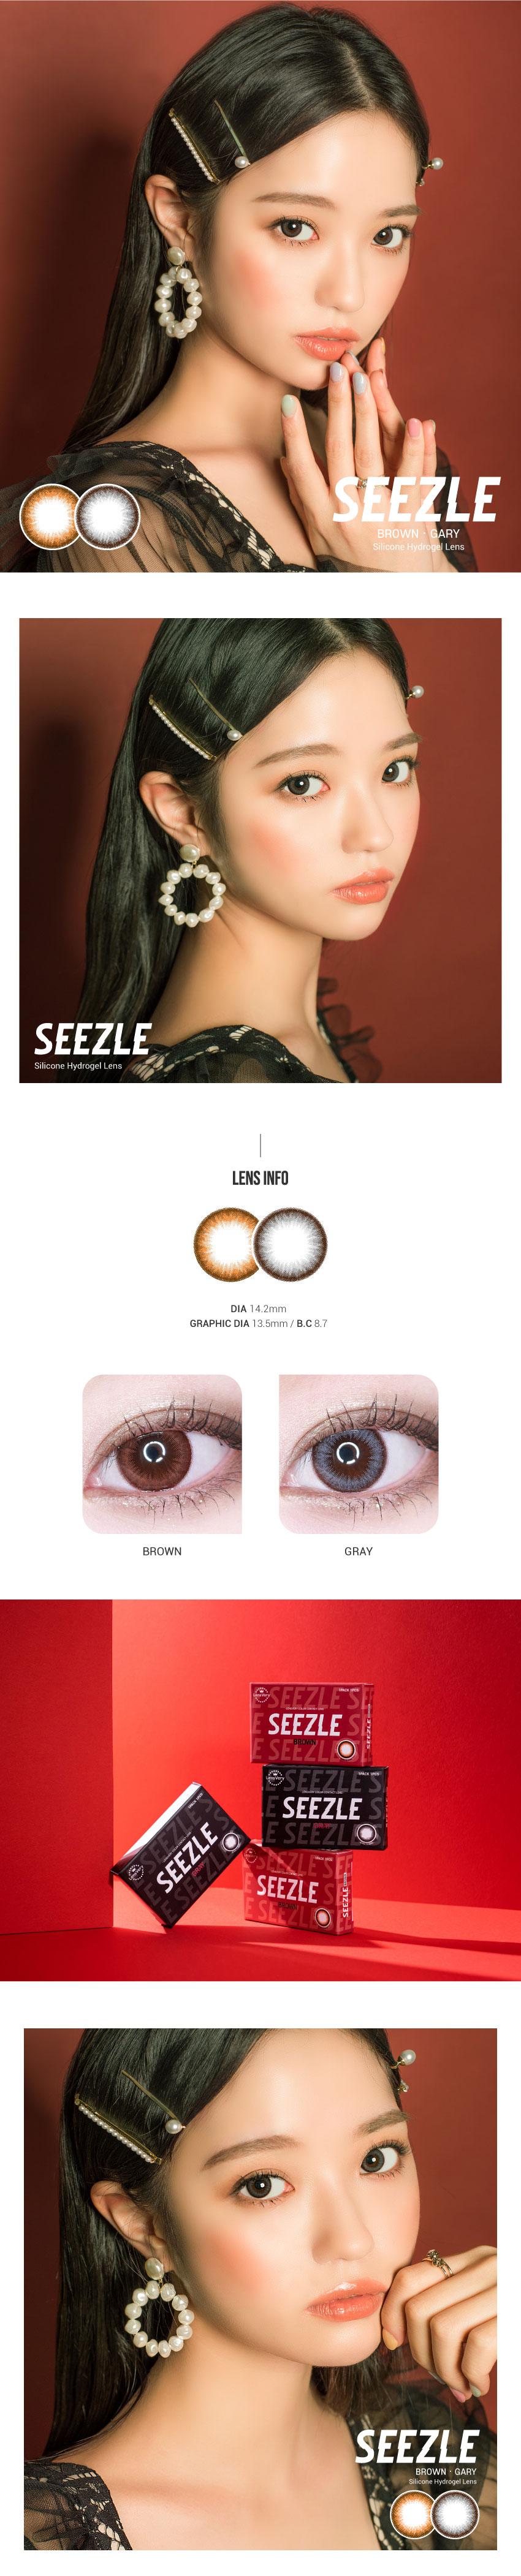 seezle-new1.jpg